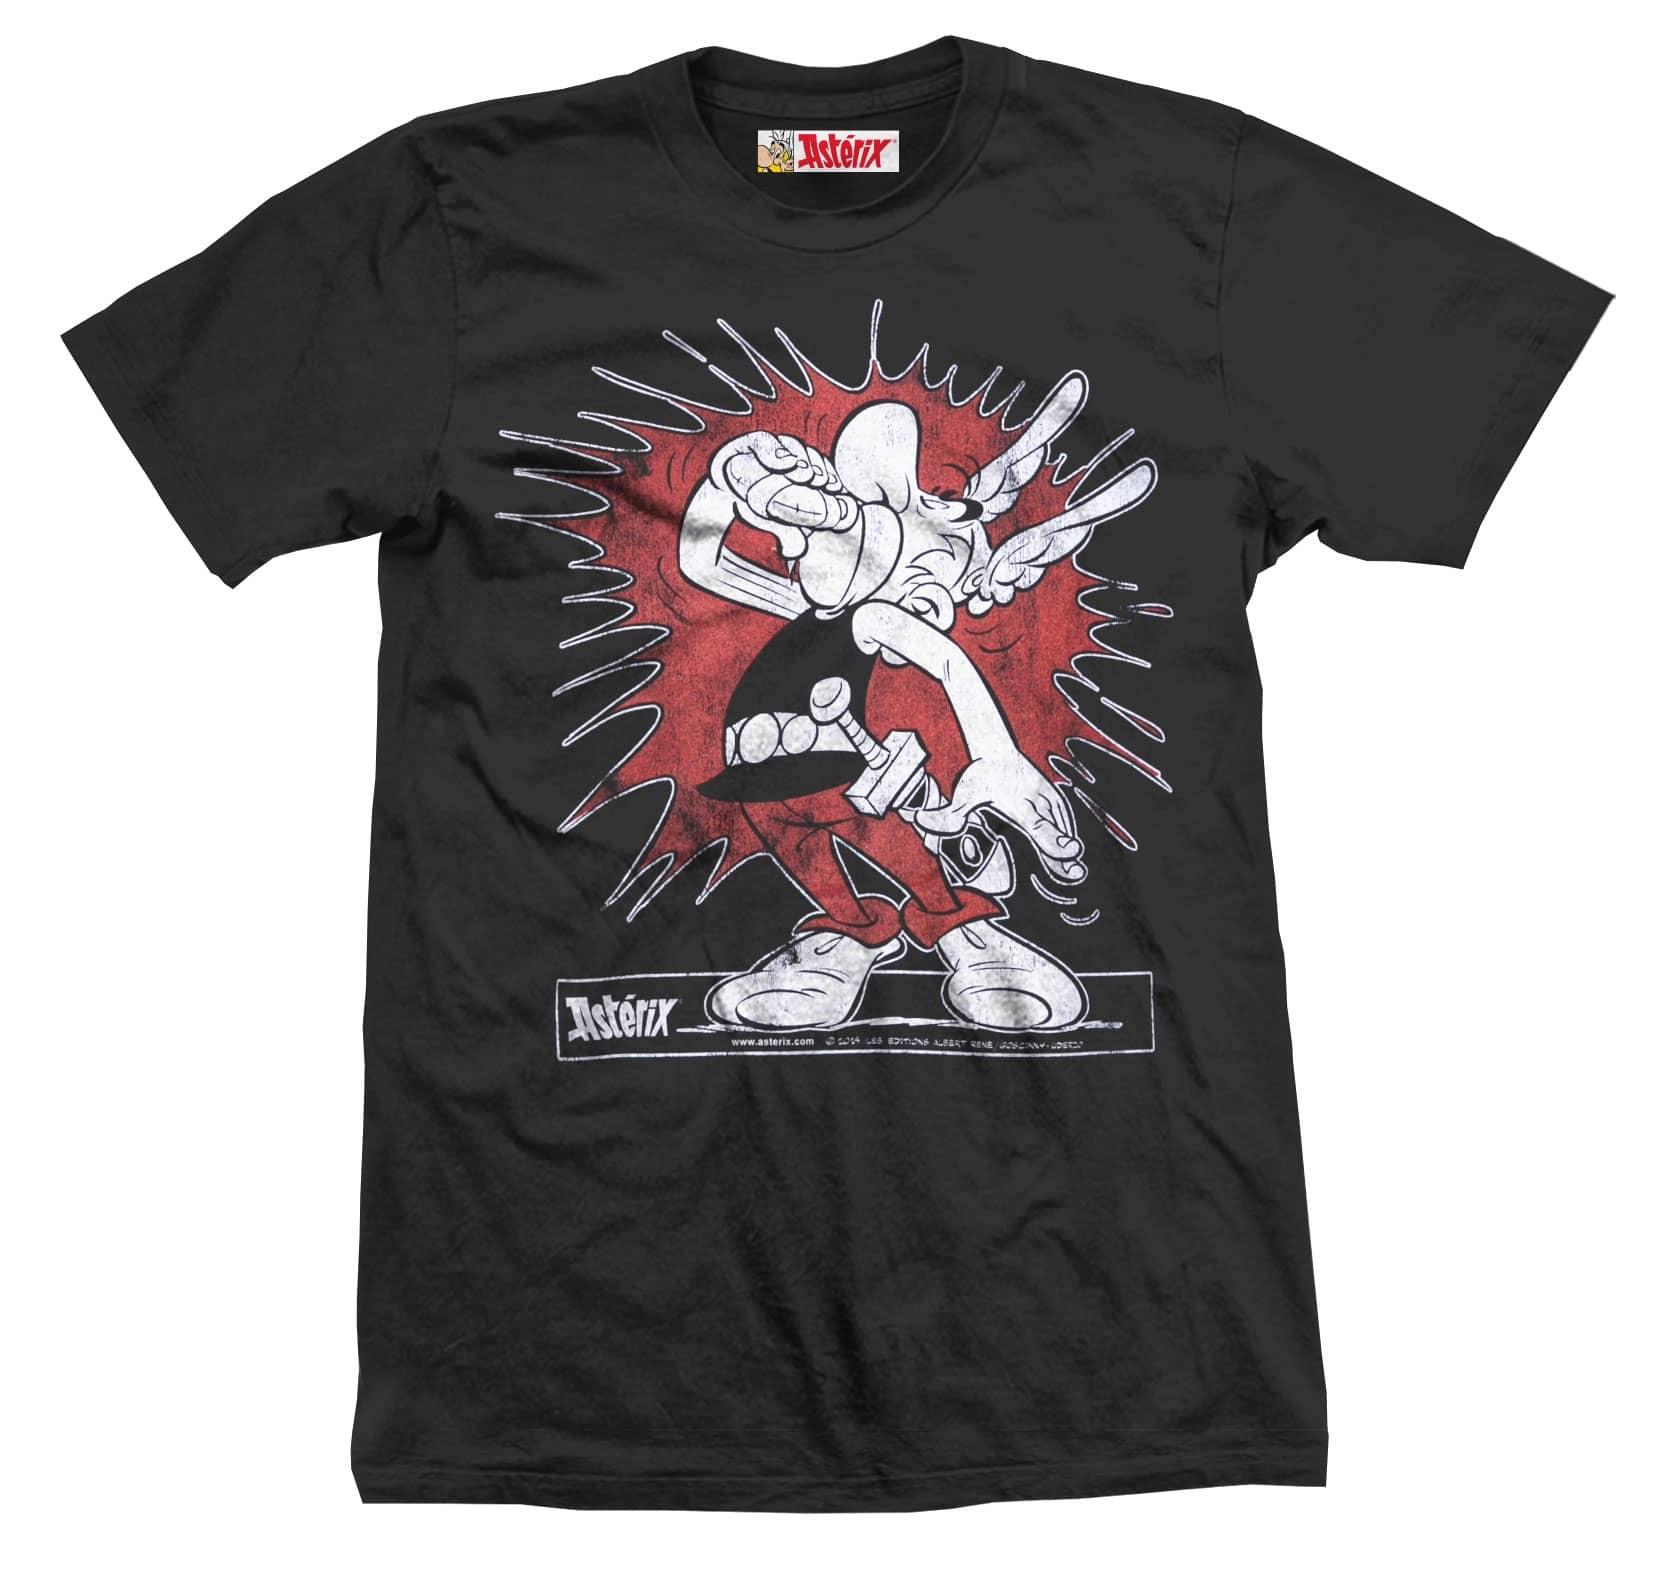 ASTERIX & OBELIX T Shirt Splash Boy Black (S)